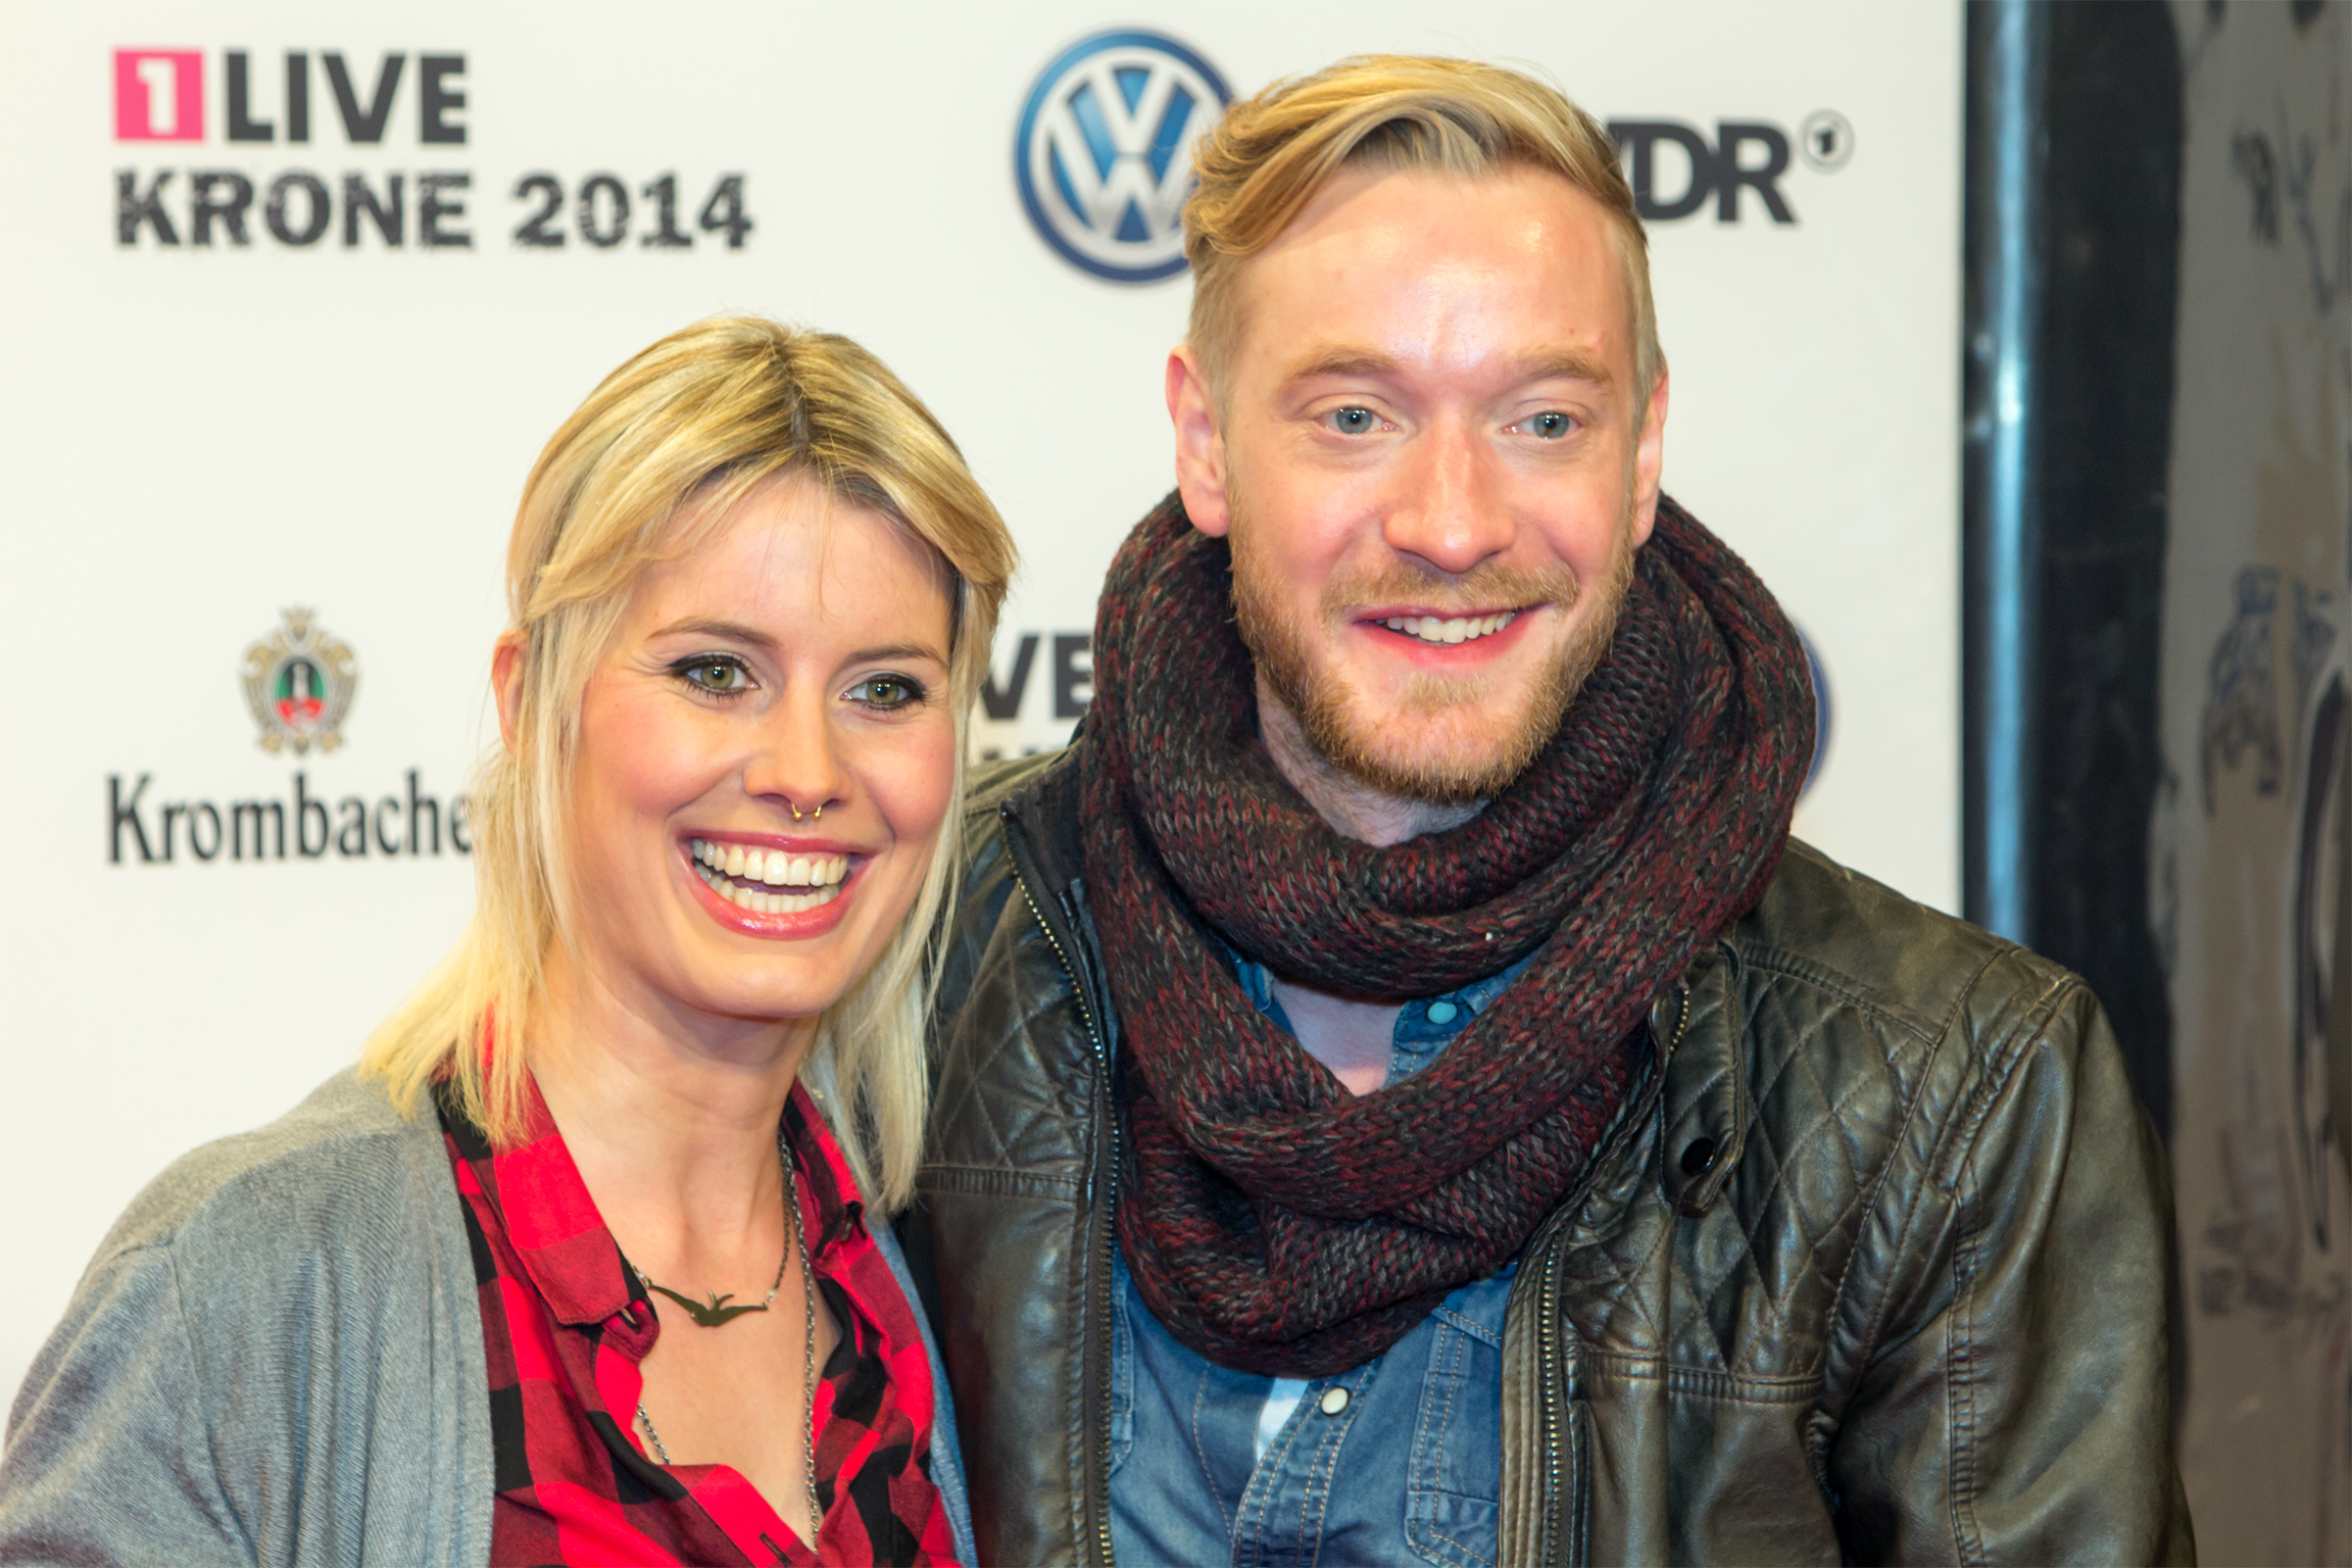 File:1LIVE Krone 2014 Pia Tillmann Steffen Donsbach.jpg